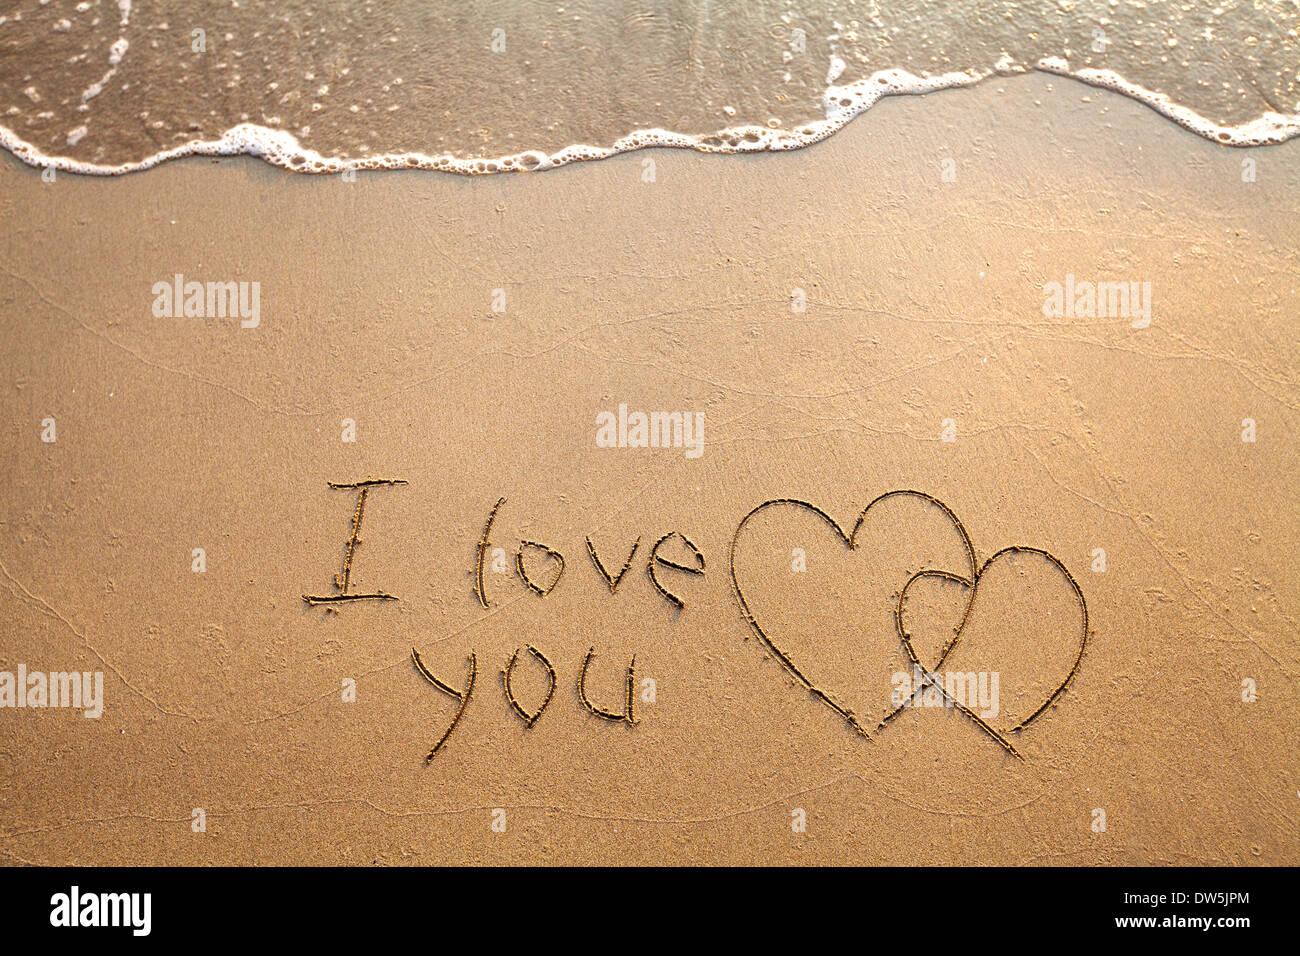 Valentine's day card, I Love You - Stock Image